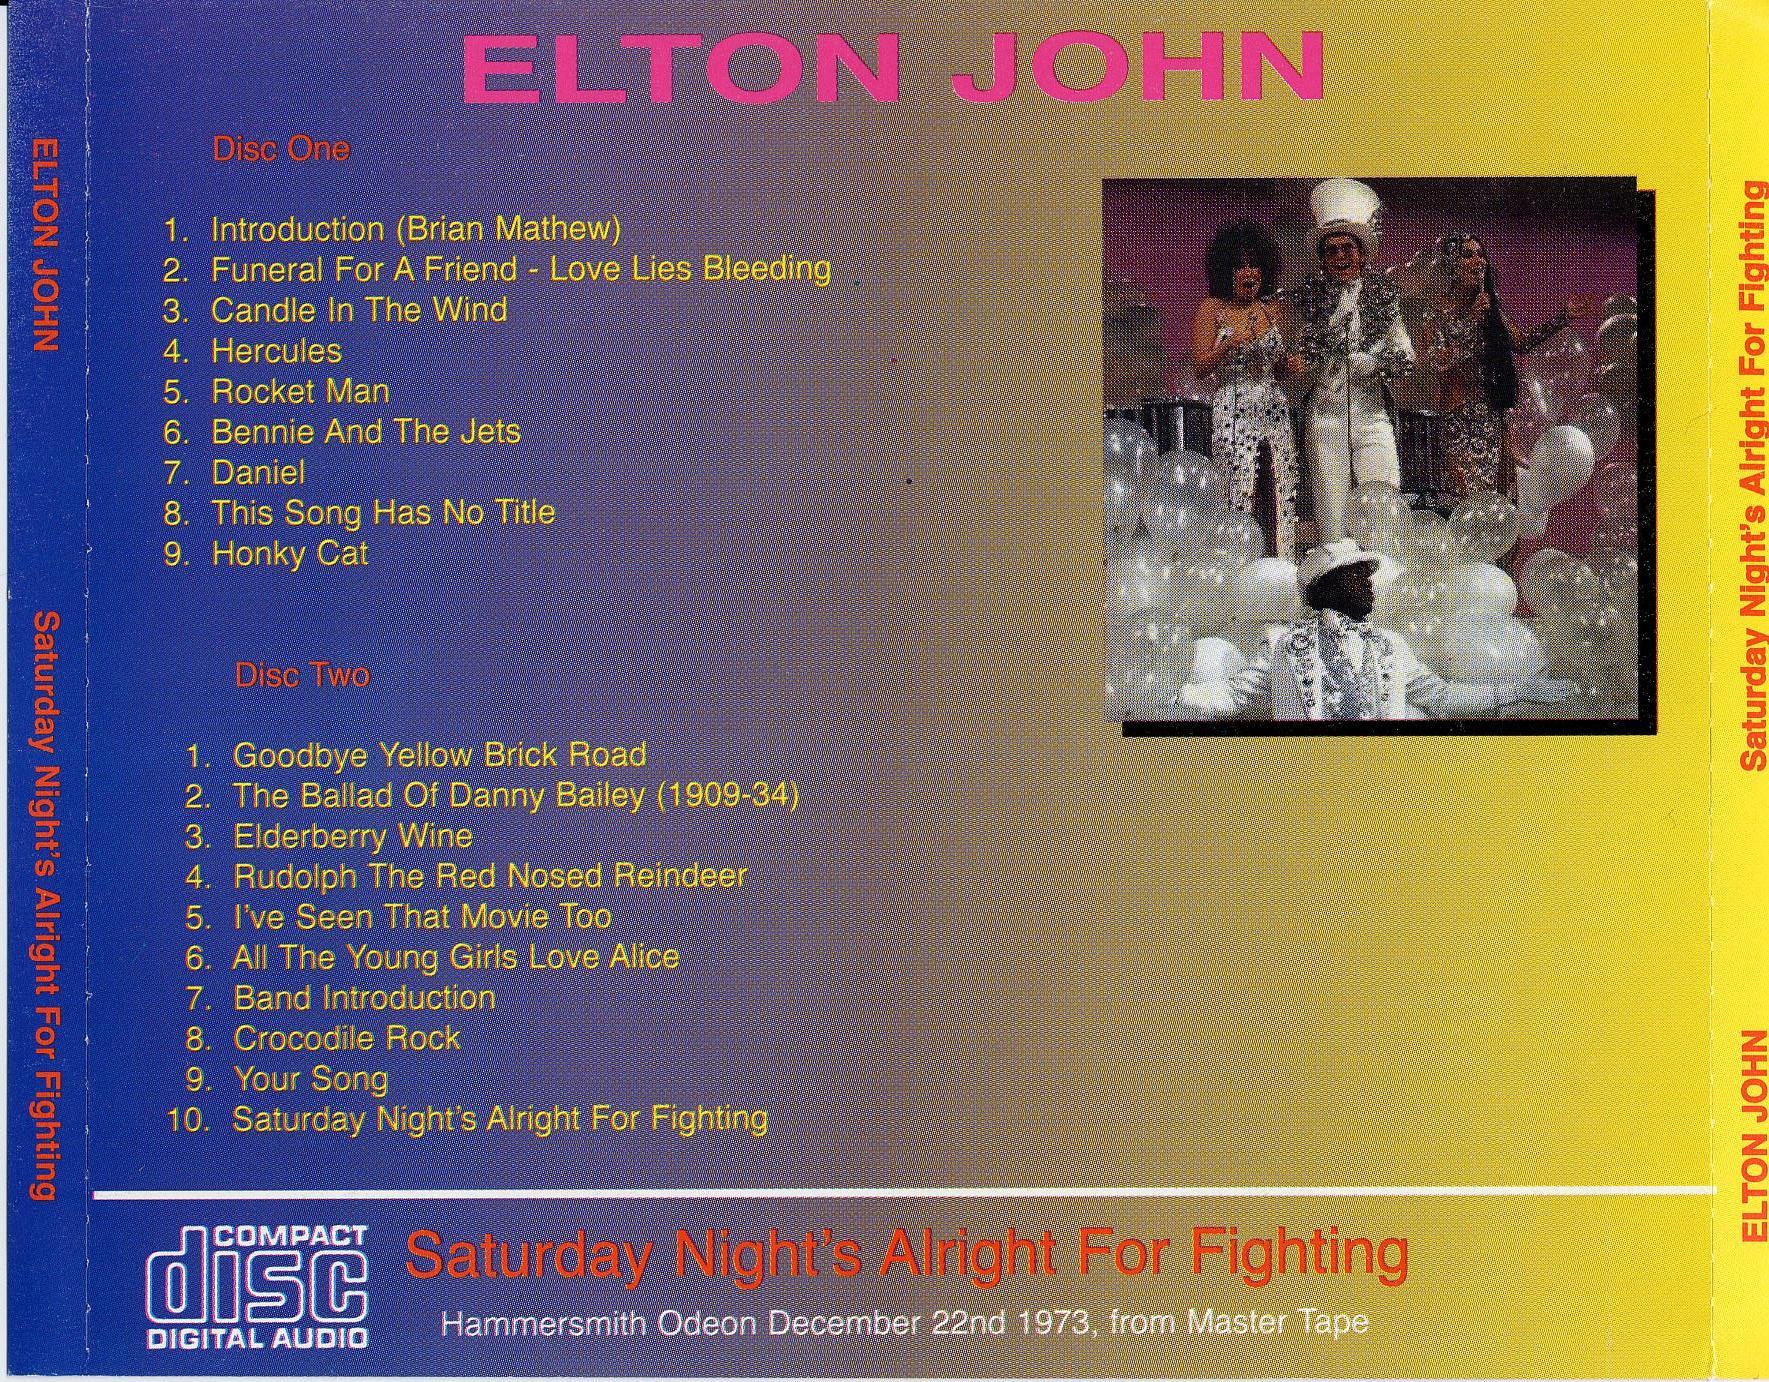 elton john 1973